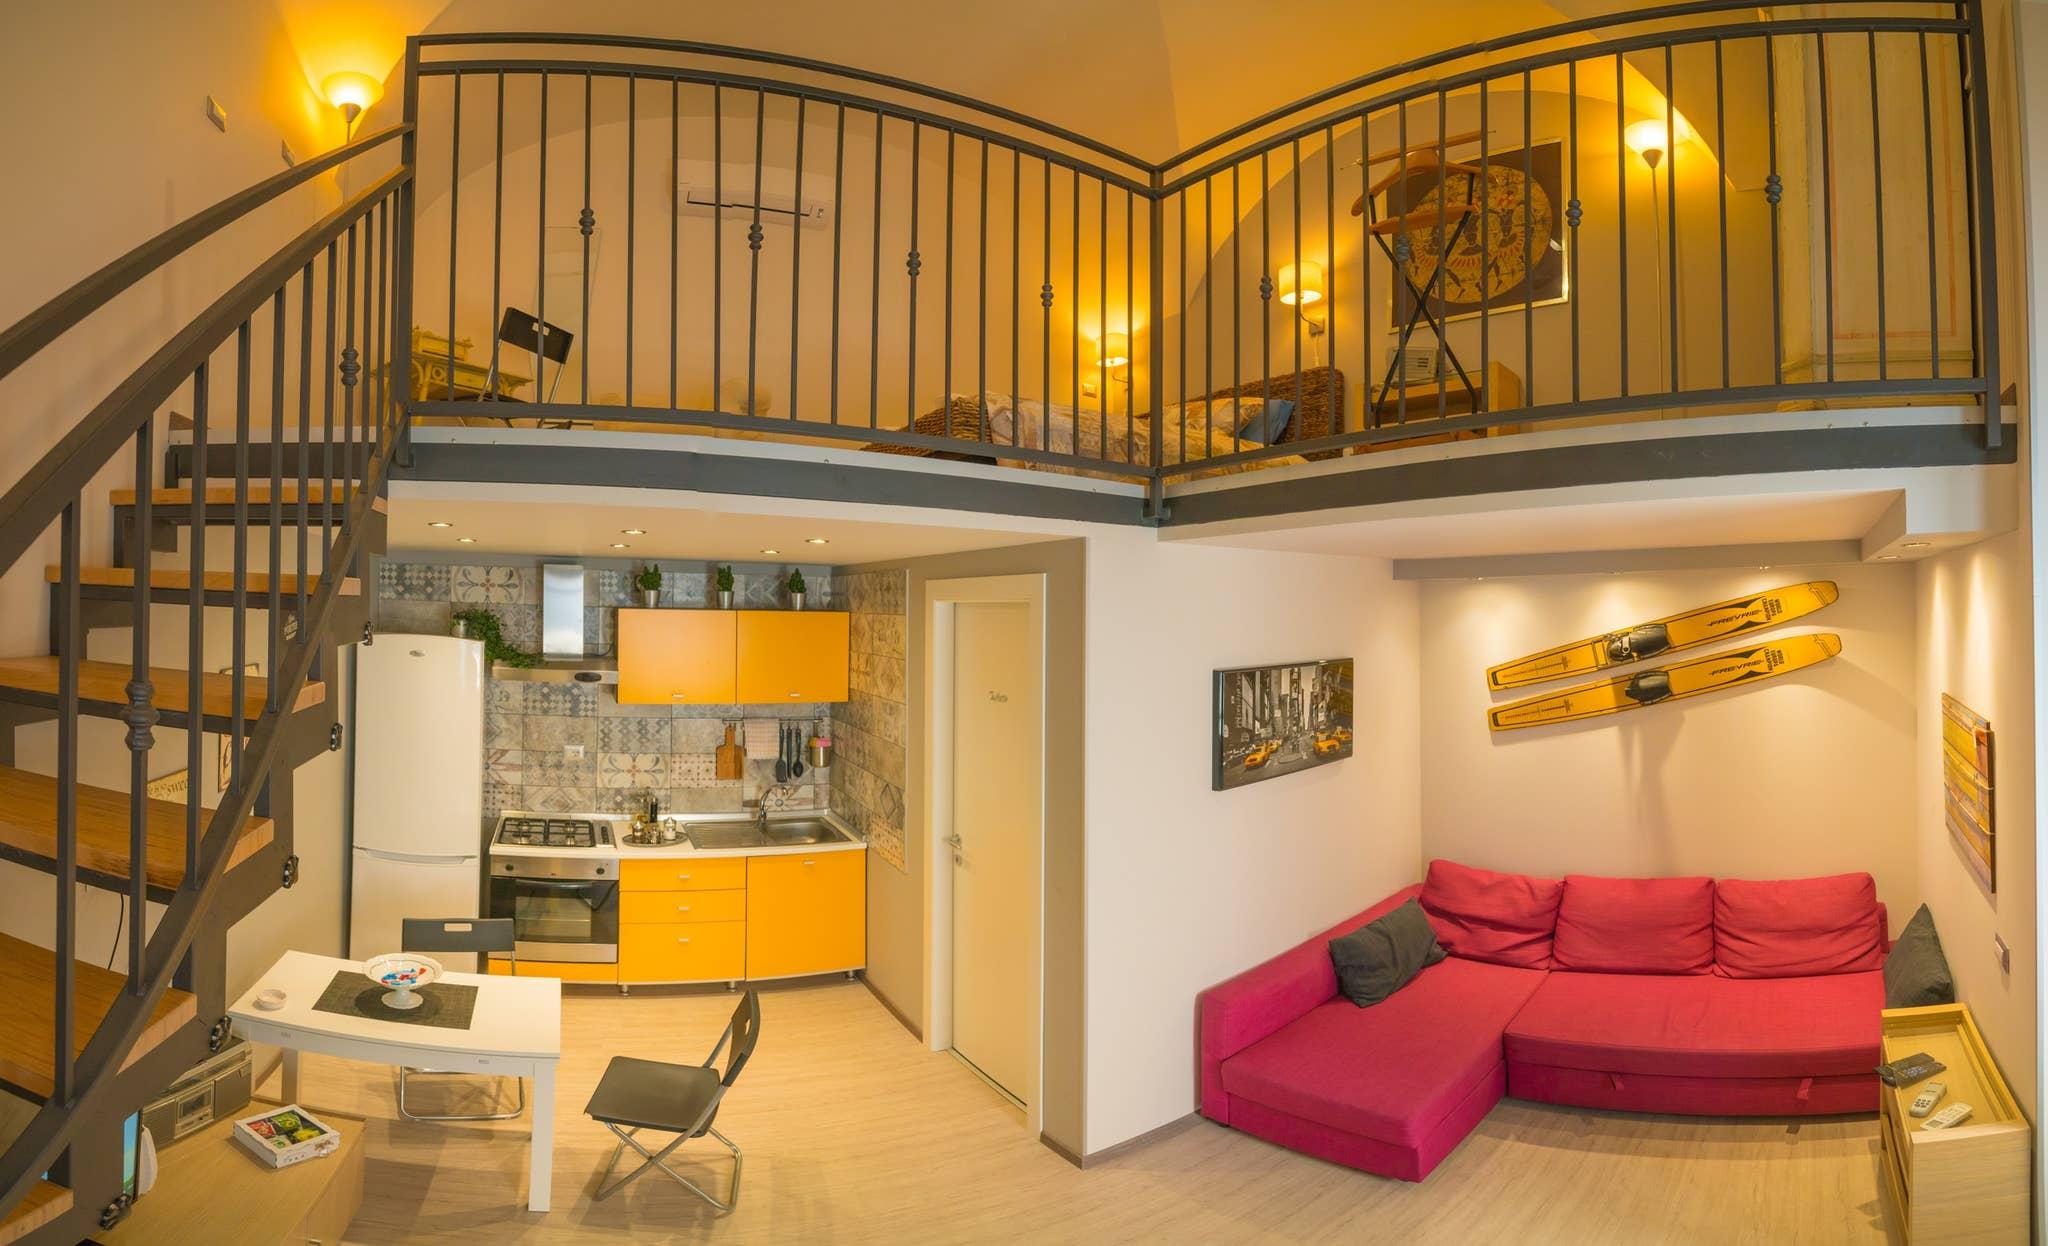 Maison de vacances  (2782175), Catania, Catania, Sicile, Italie, image 12